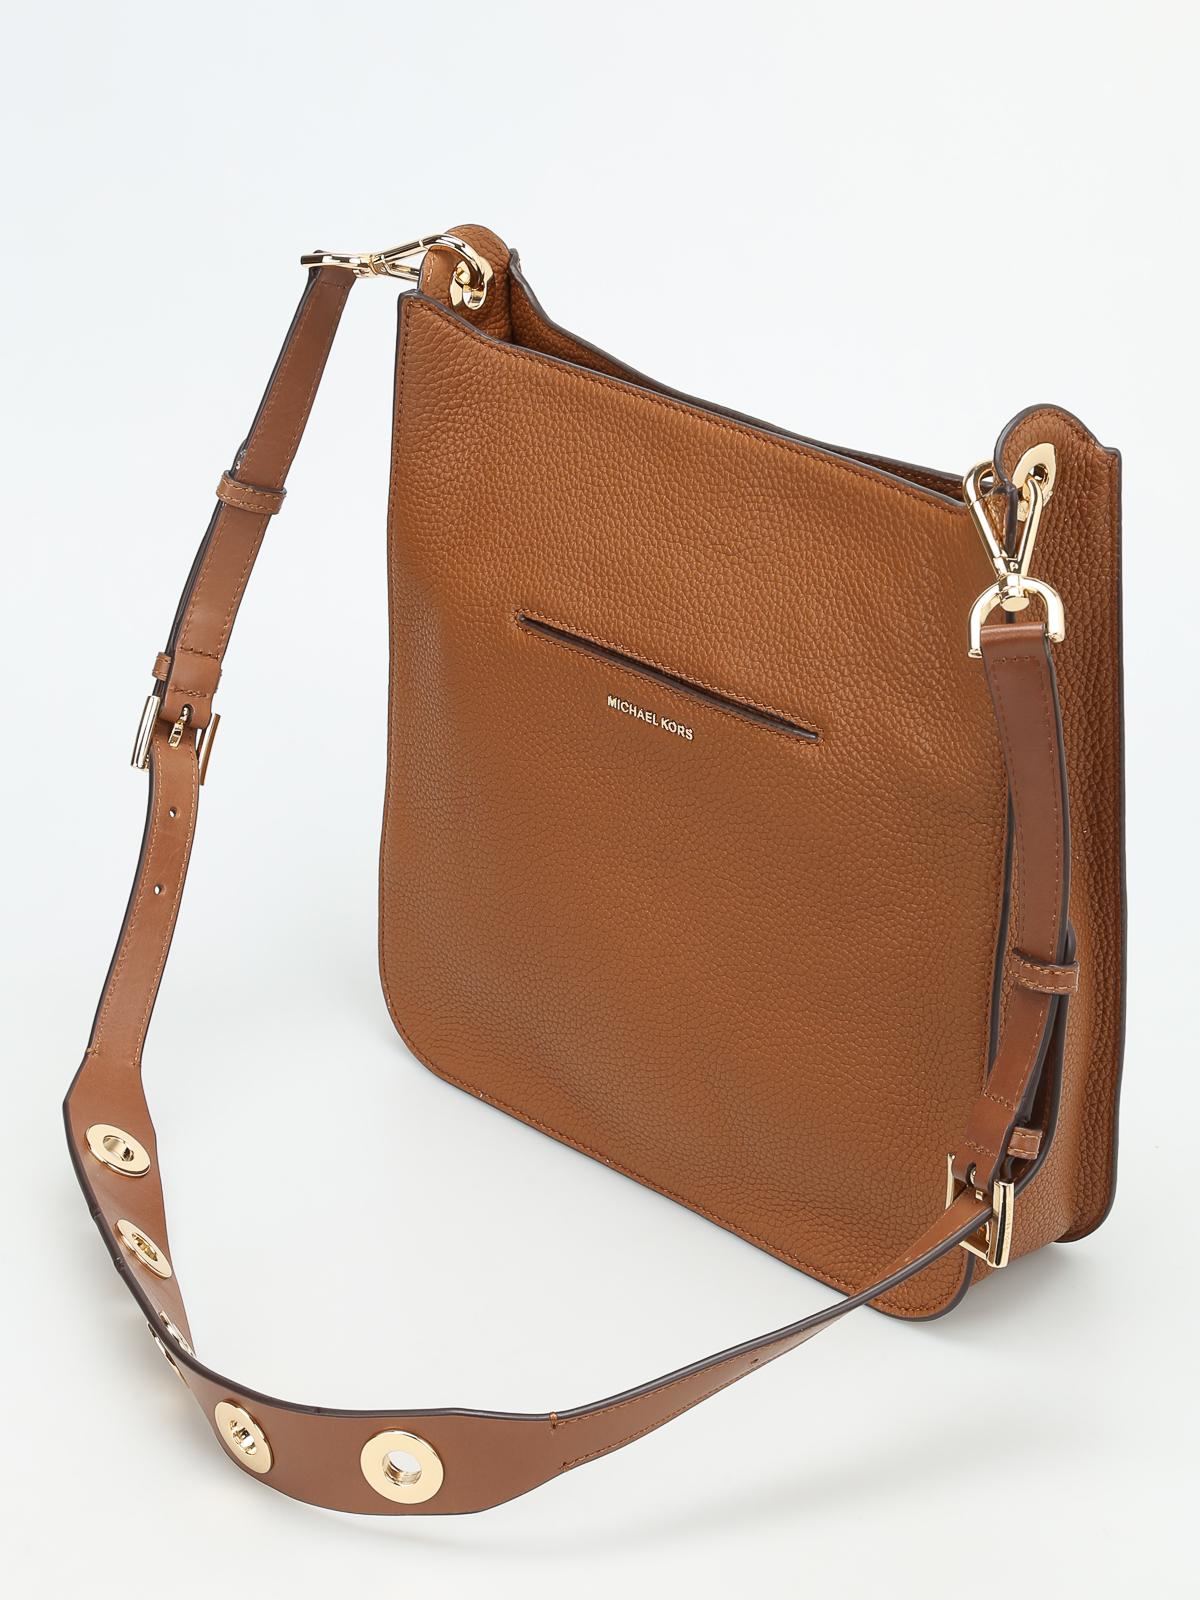 7e314b0512f3 iKRIX MICHAEL KORS  shoulder bags - Sullivan large messenger bag